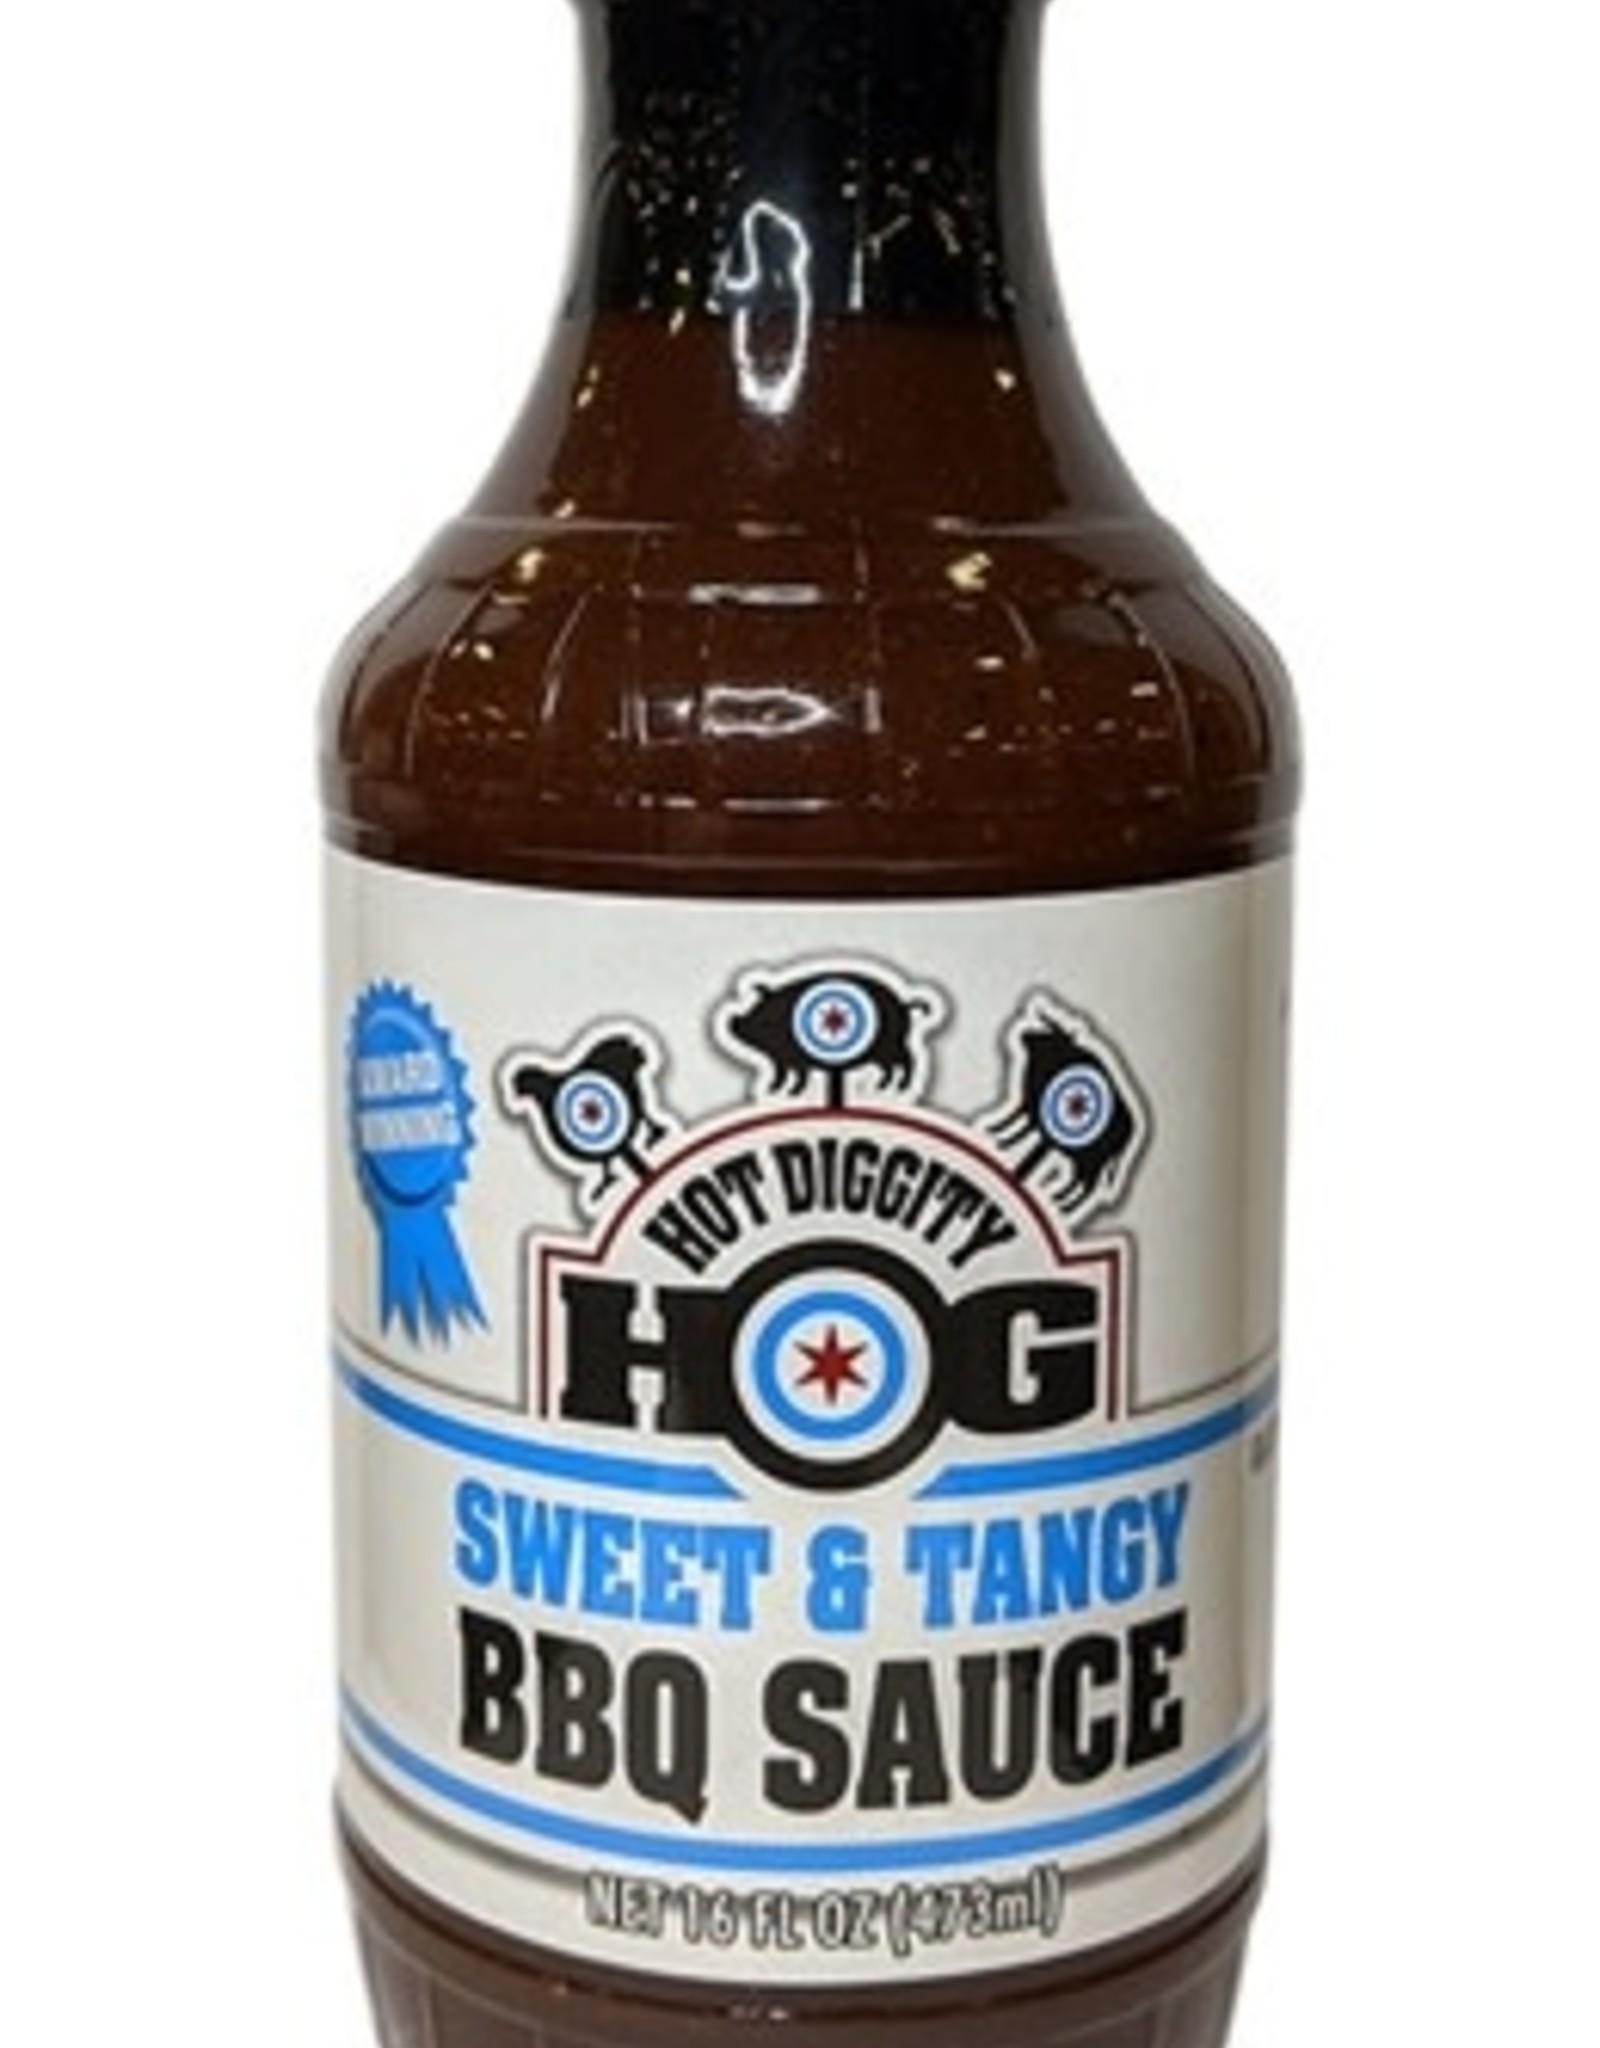 Hot Diggity Hog Sweet & Tangy BBQ Sauce, 16oz.